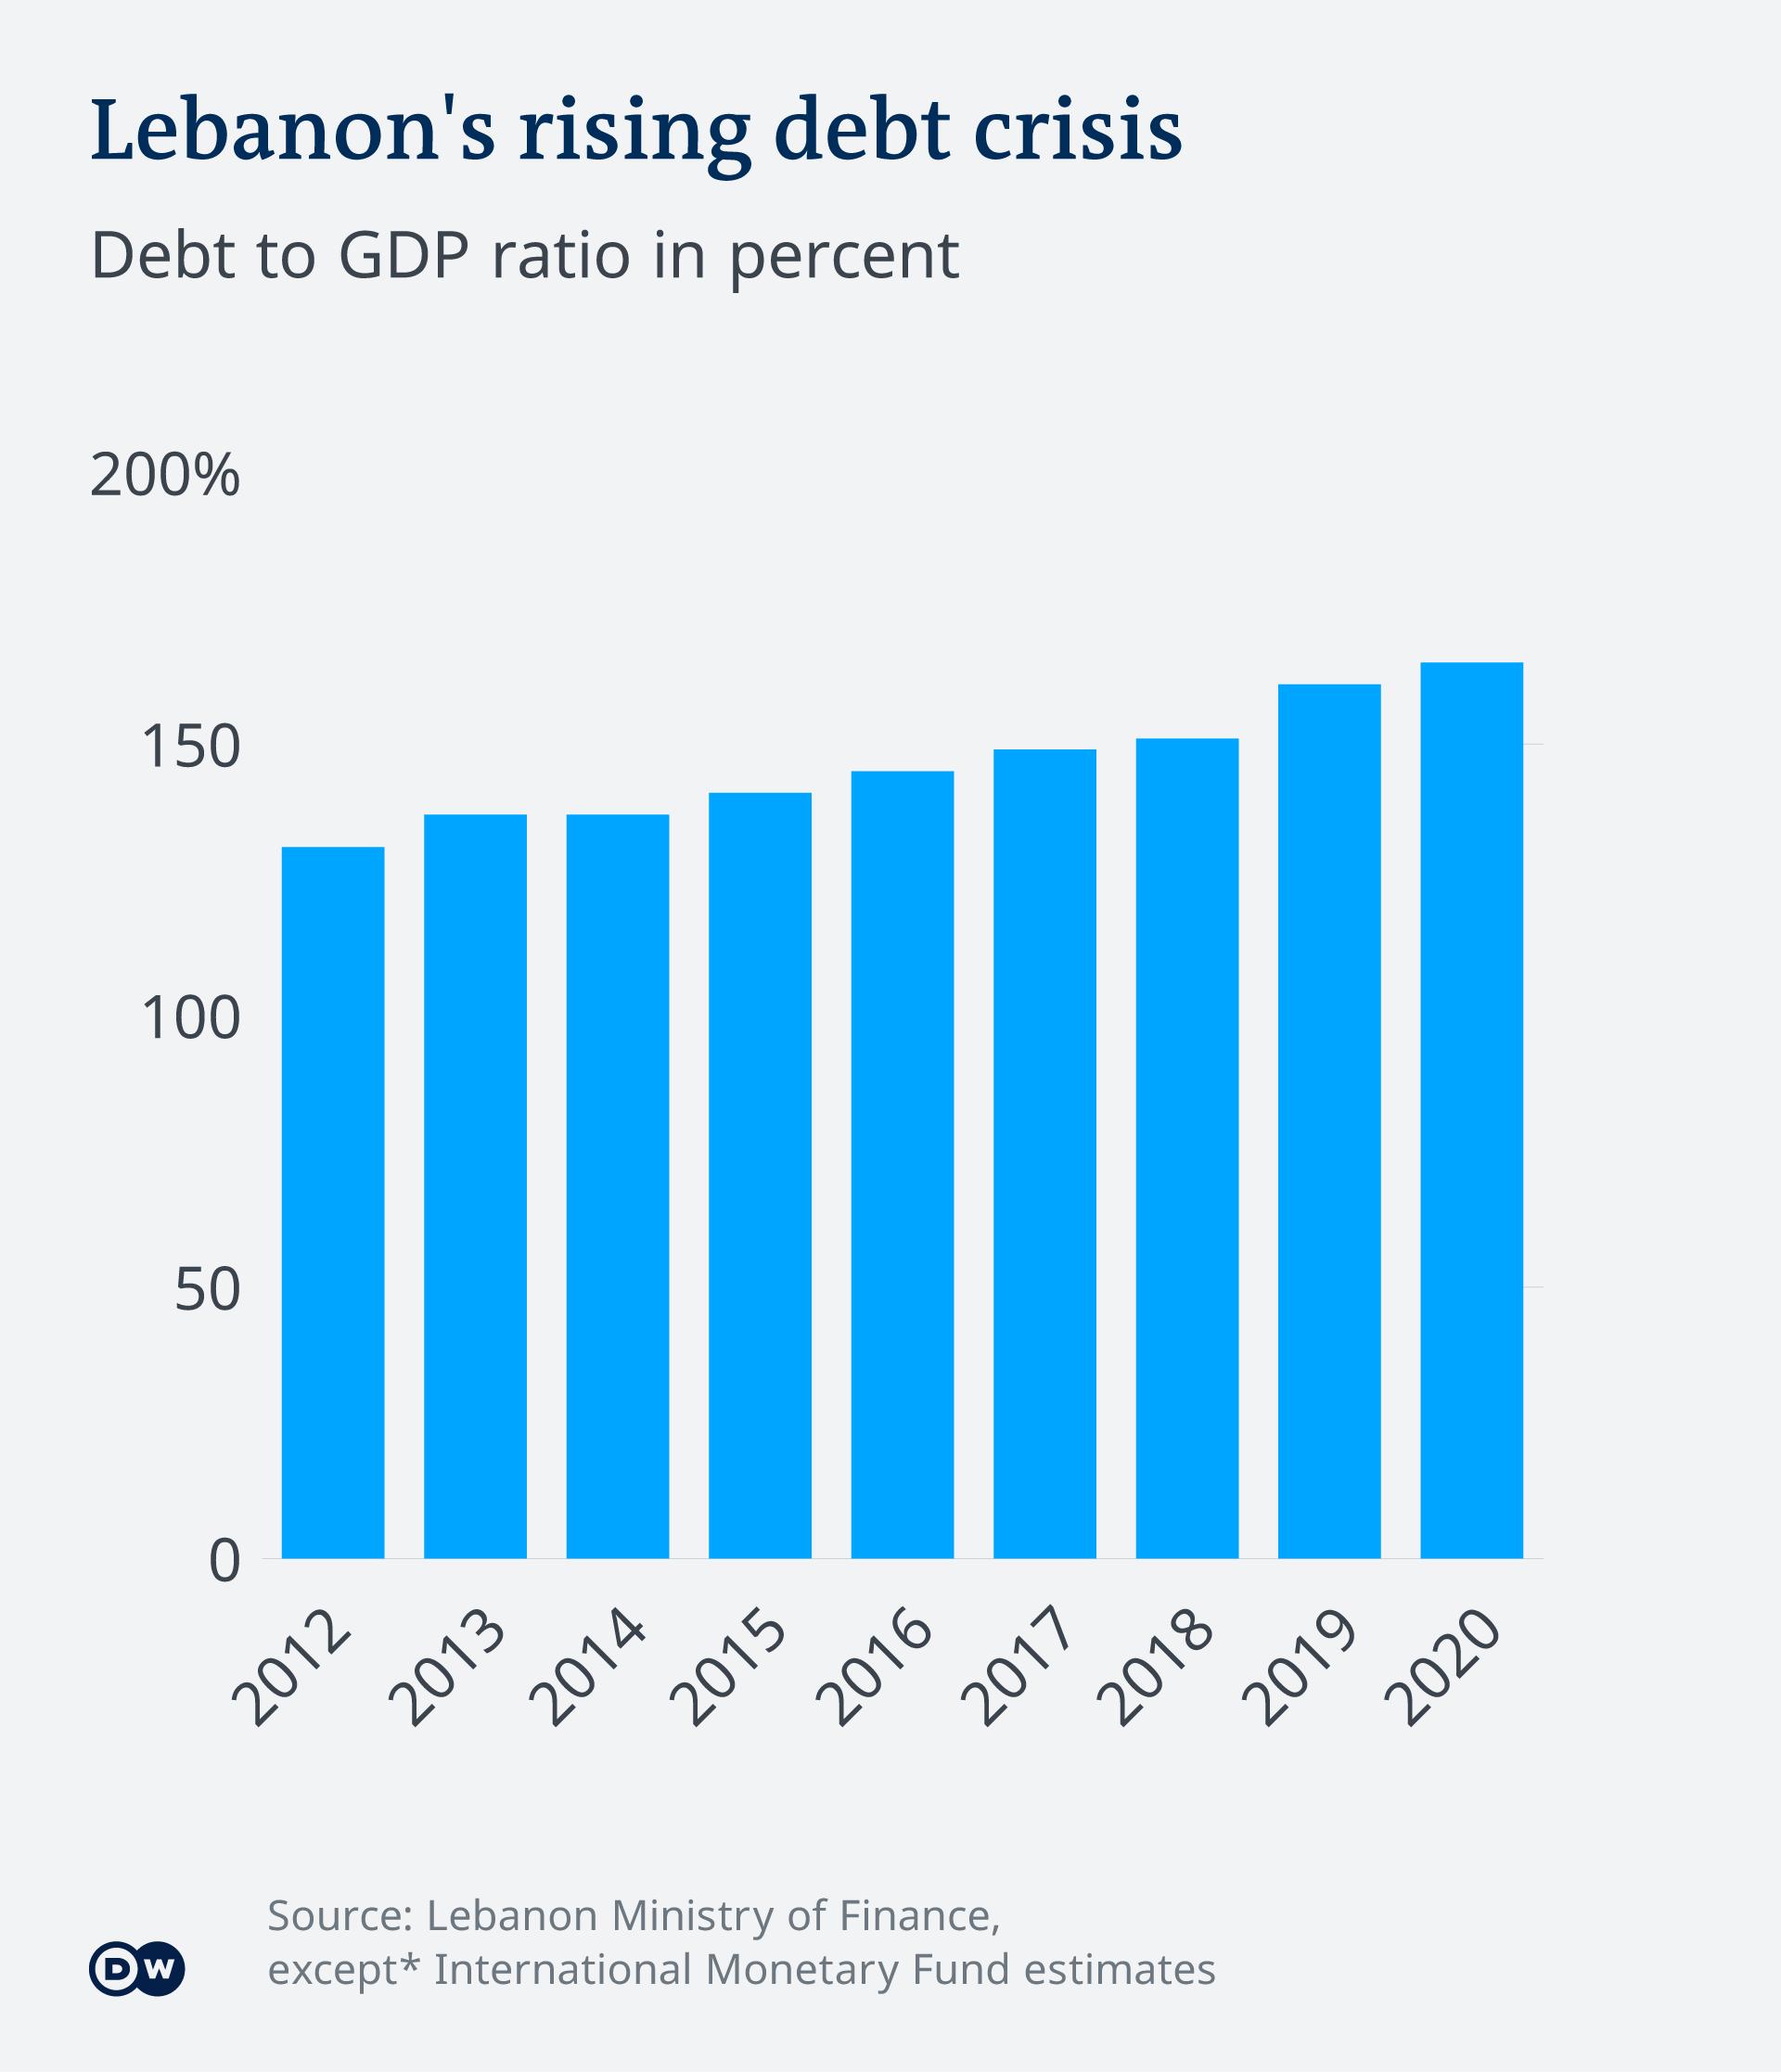 Lebanon's rising debt